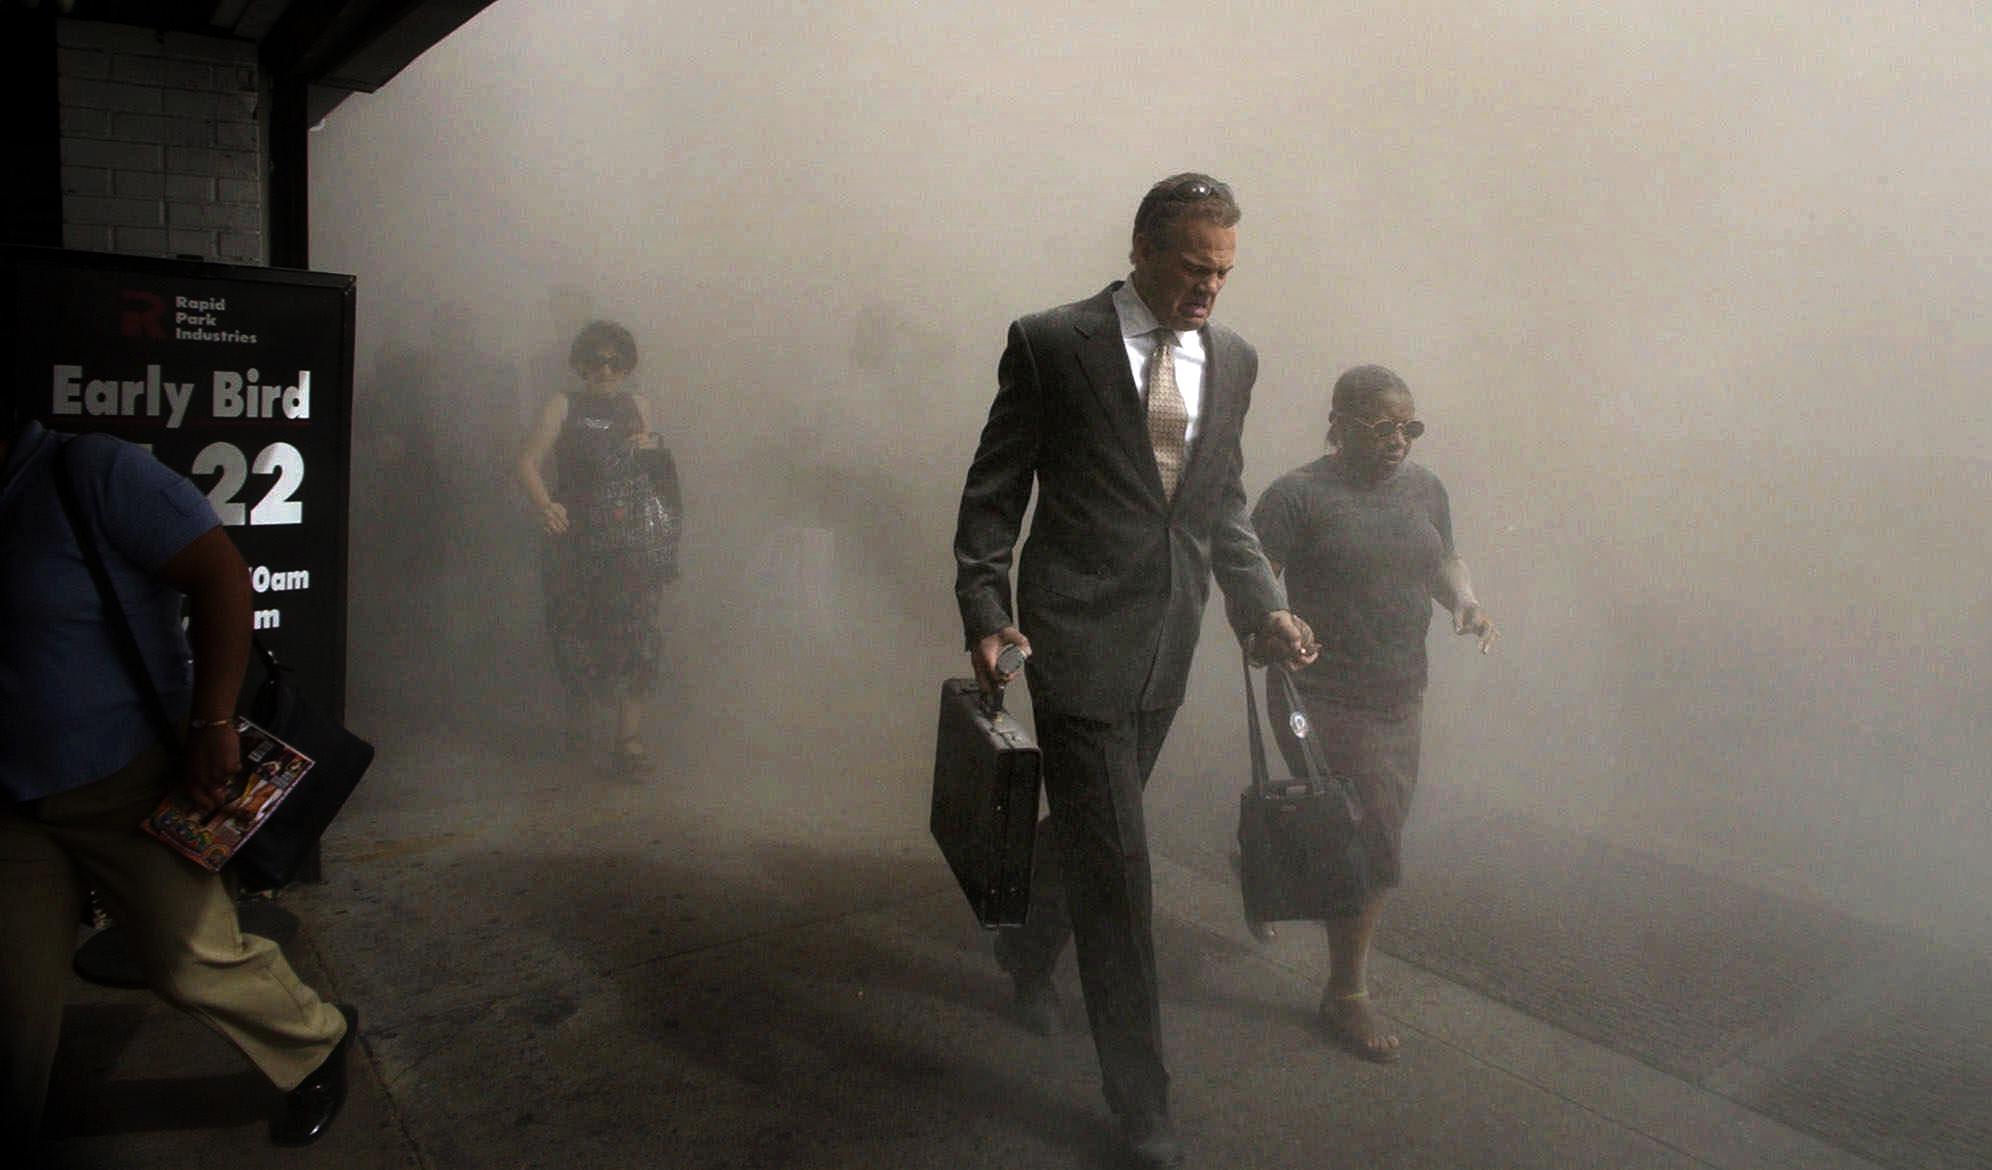 Pedestrians flee the area of New York's World Trade Center in lower Manhattan on Tuesday, Sept. 11, 2001. (AP Photo/Amy Sancetta)